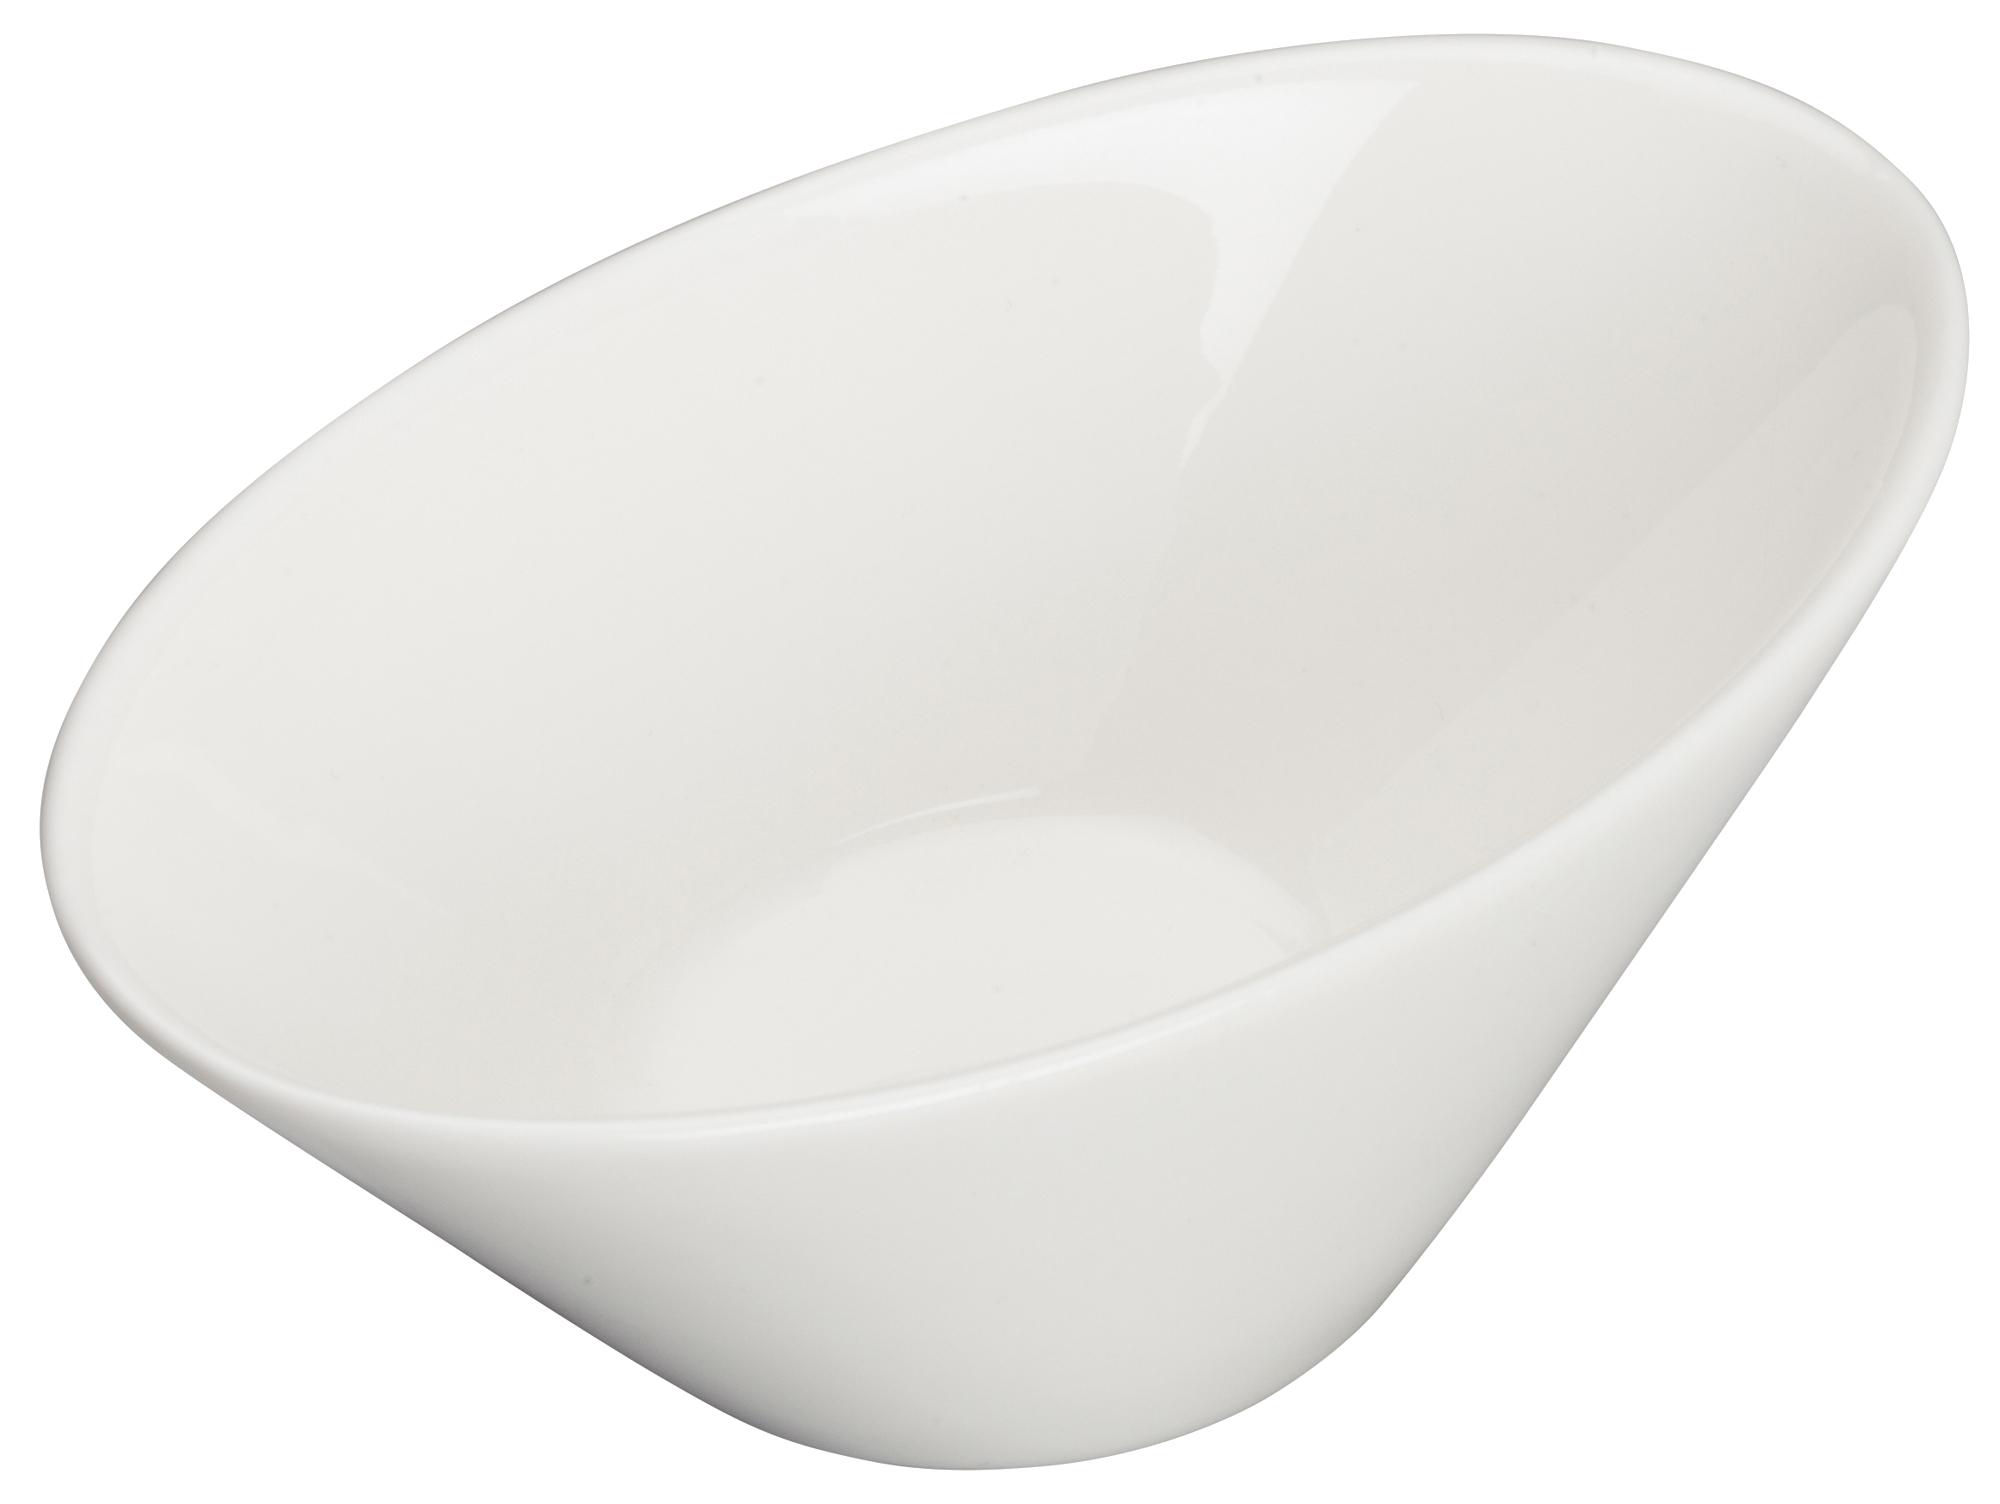 Winco WDP021-108 china, bowl,  0 - 8 oz